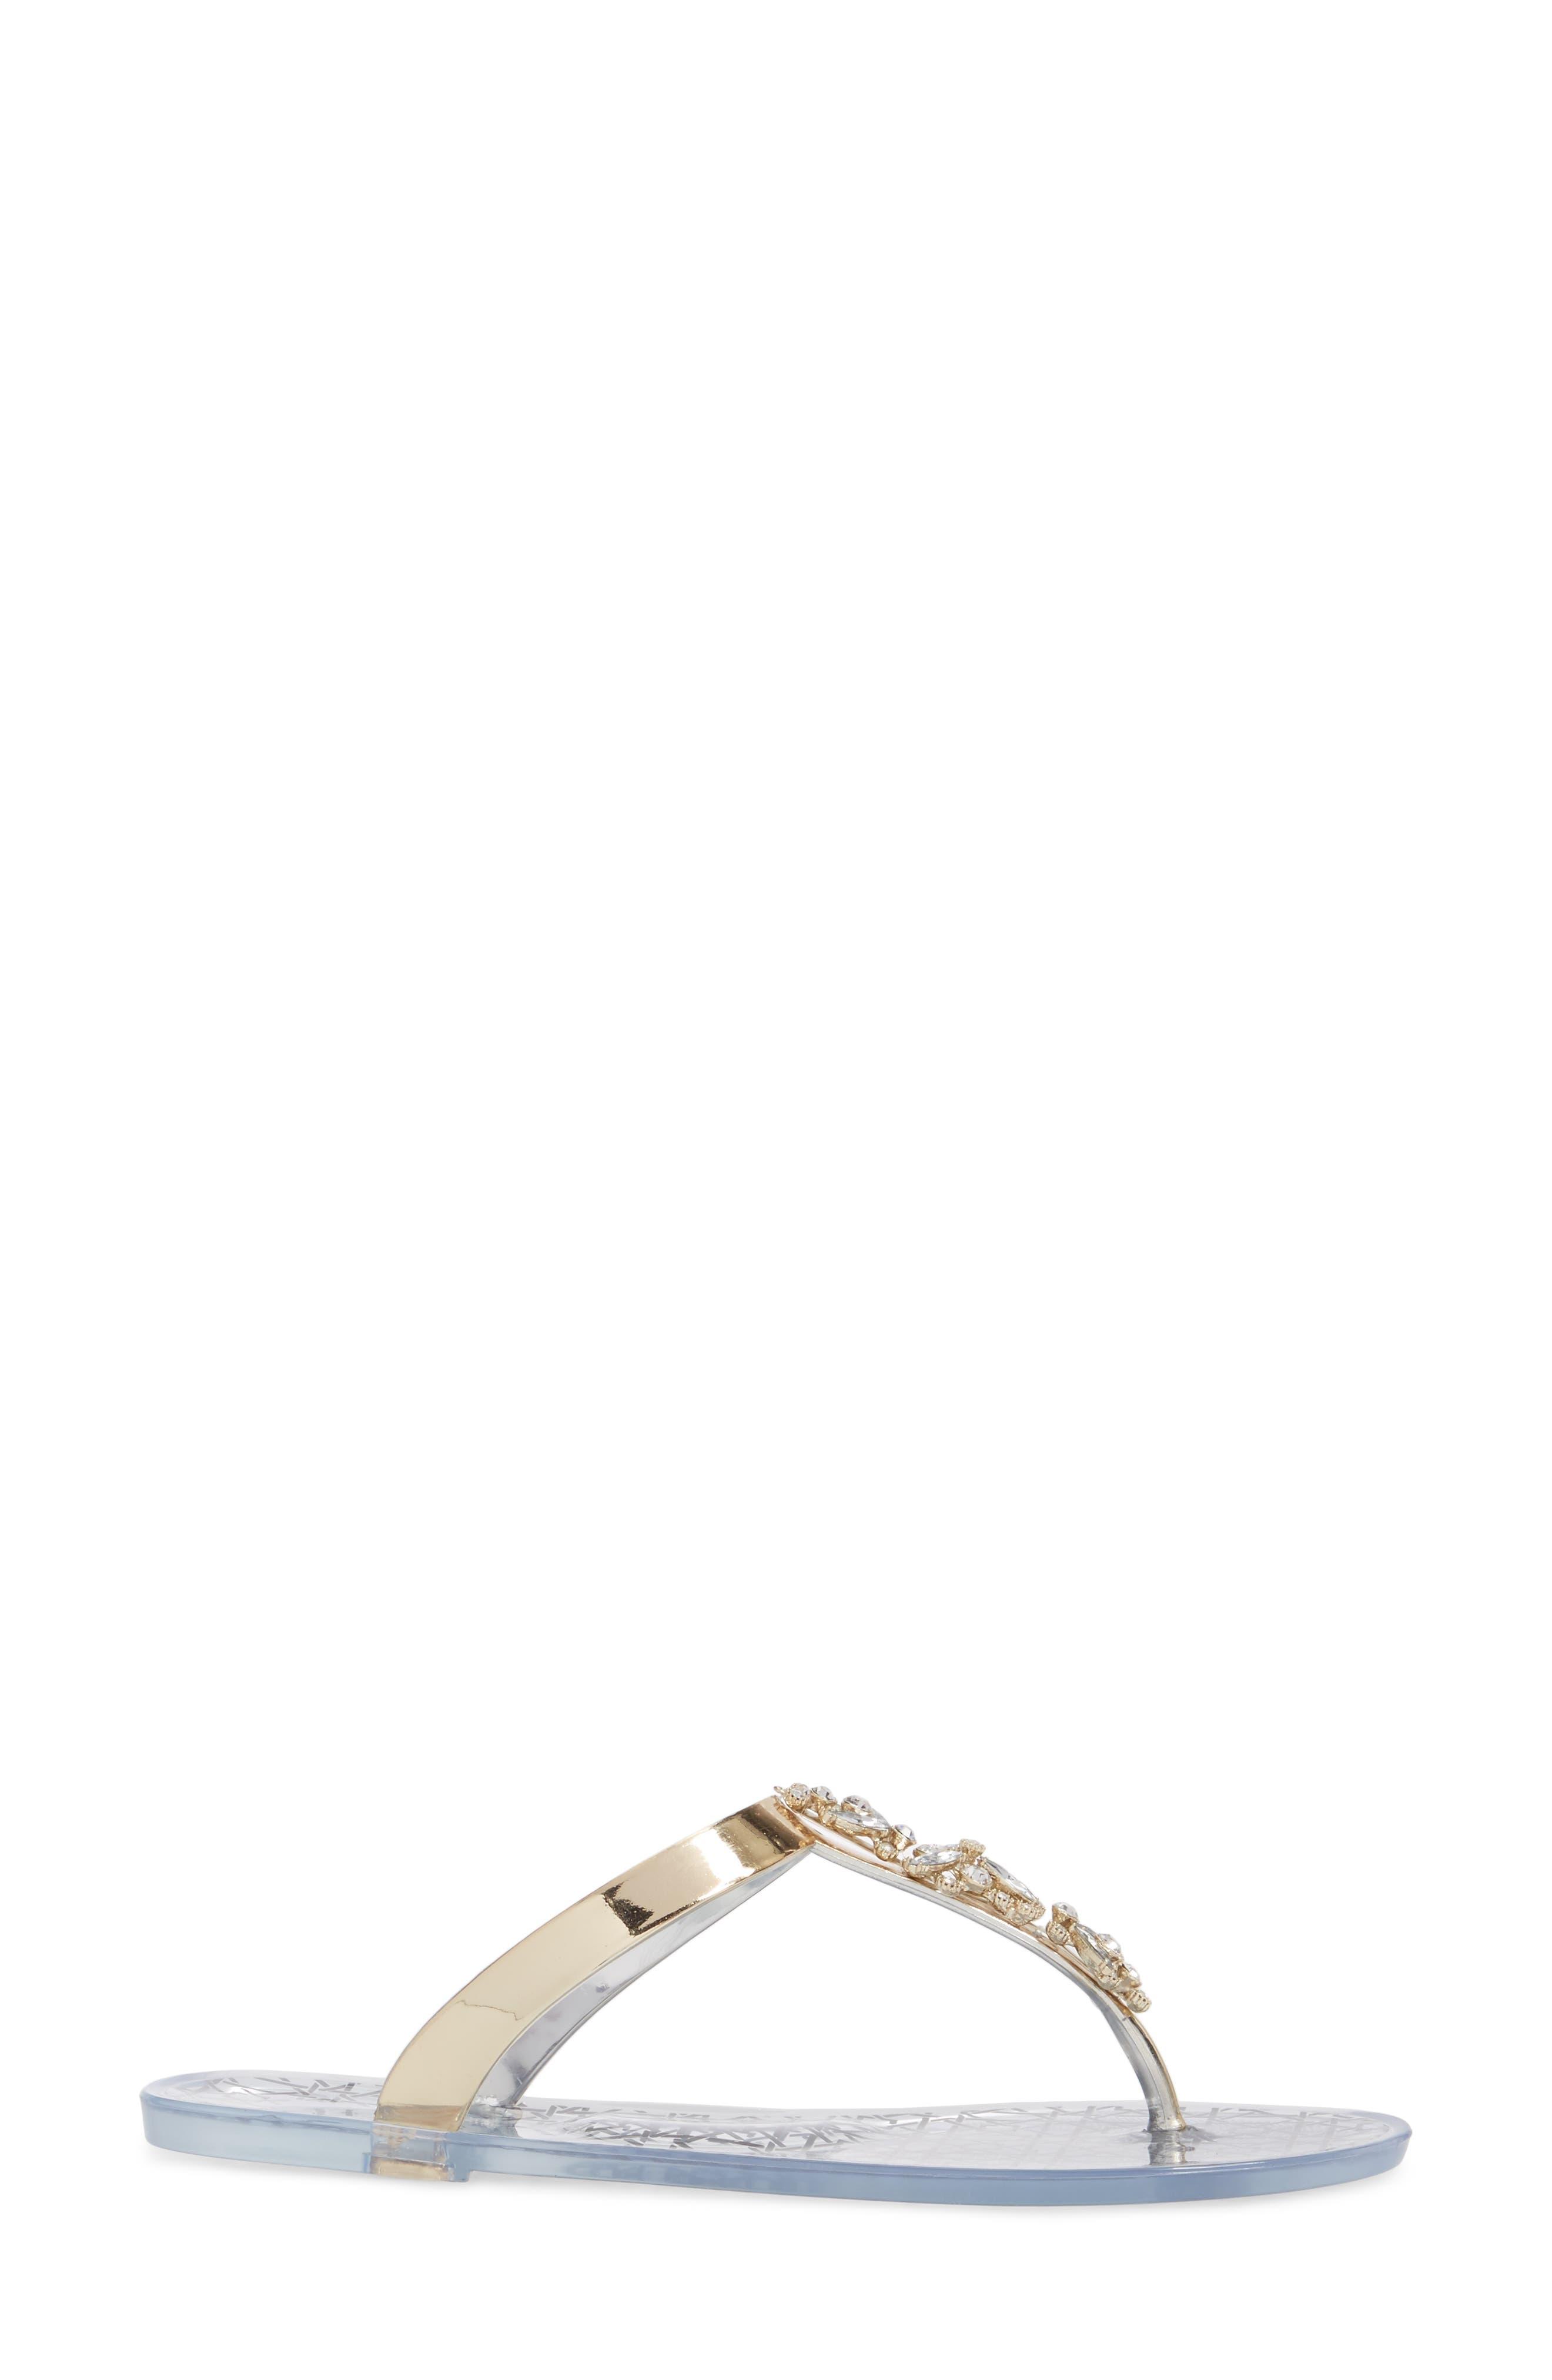 Gracia Embellished Sandal,                             Alternate thumbnail 12, color,